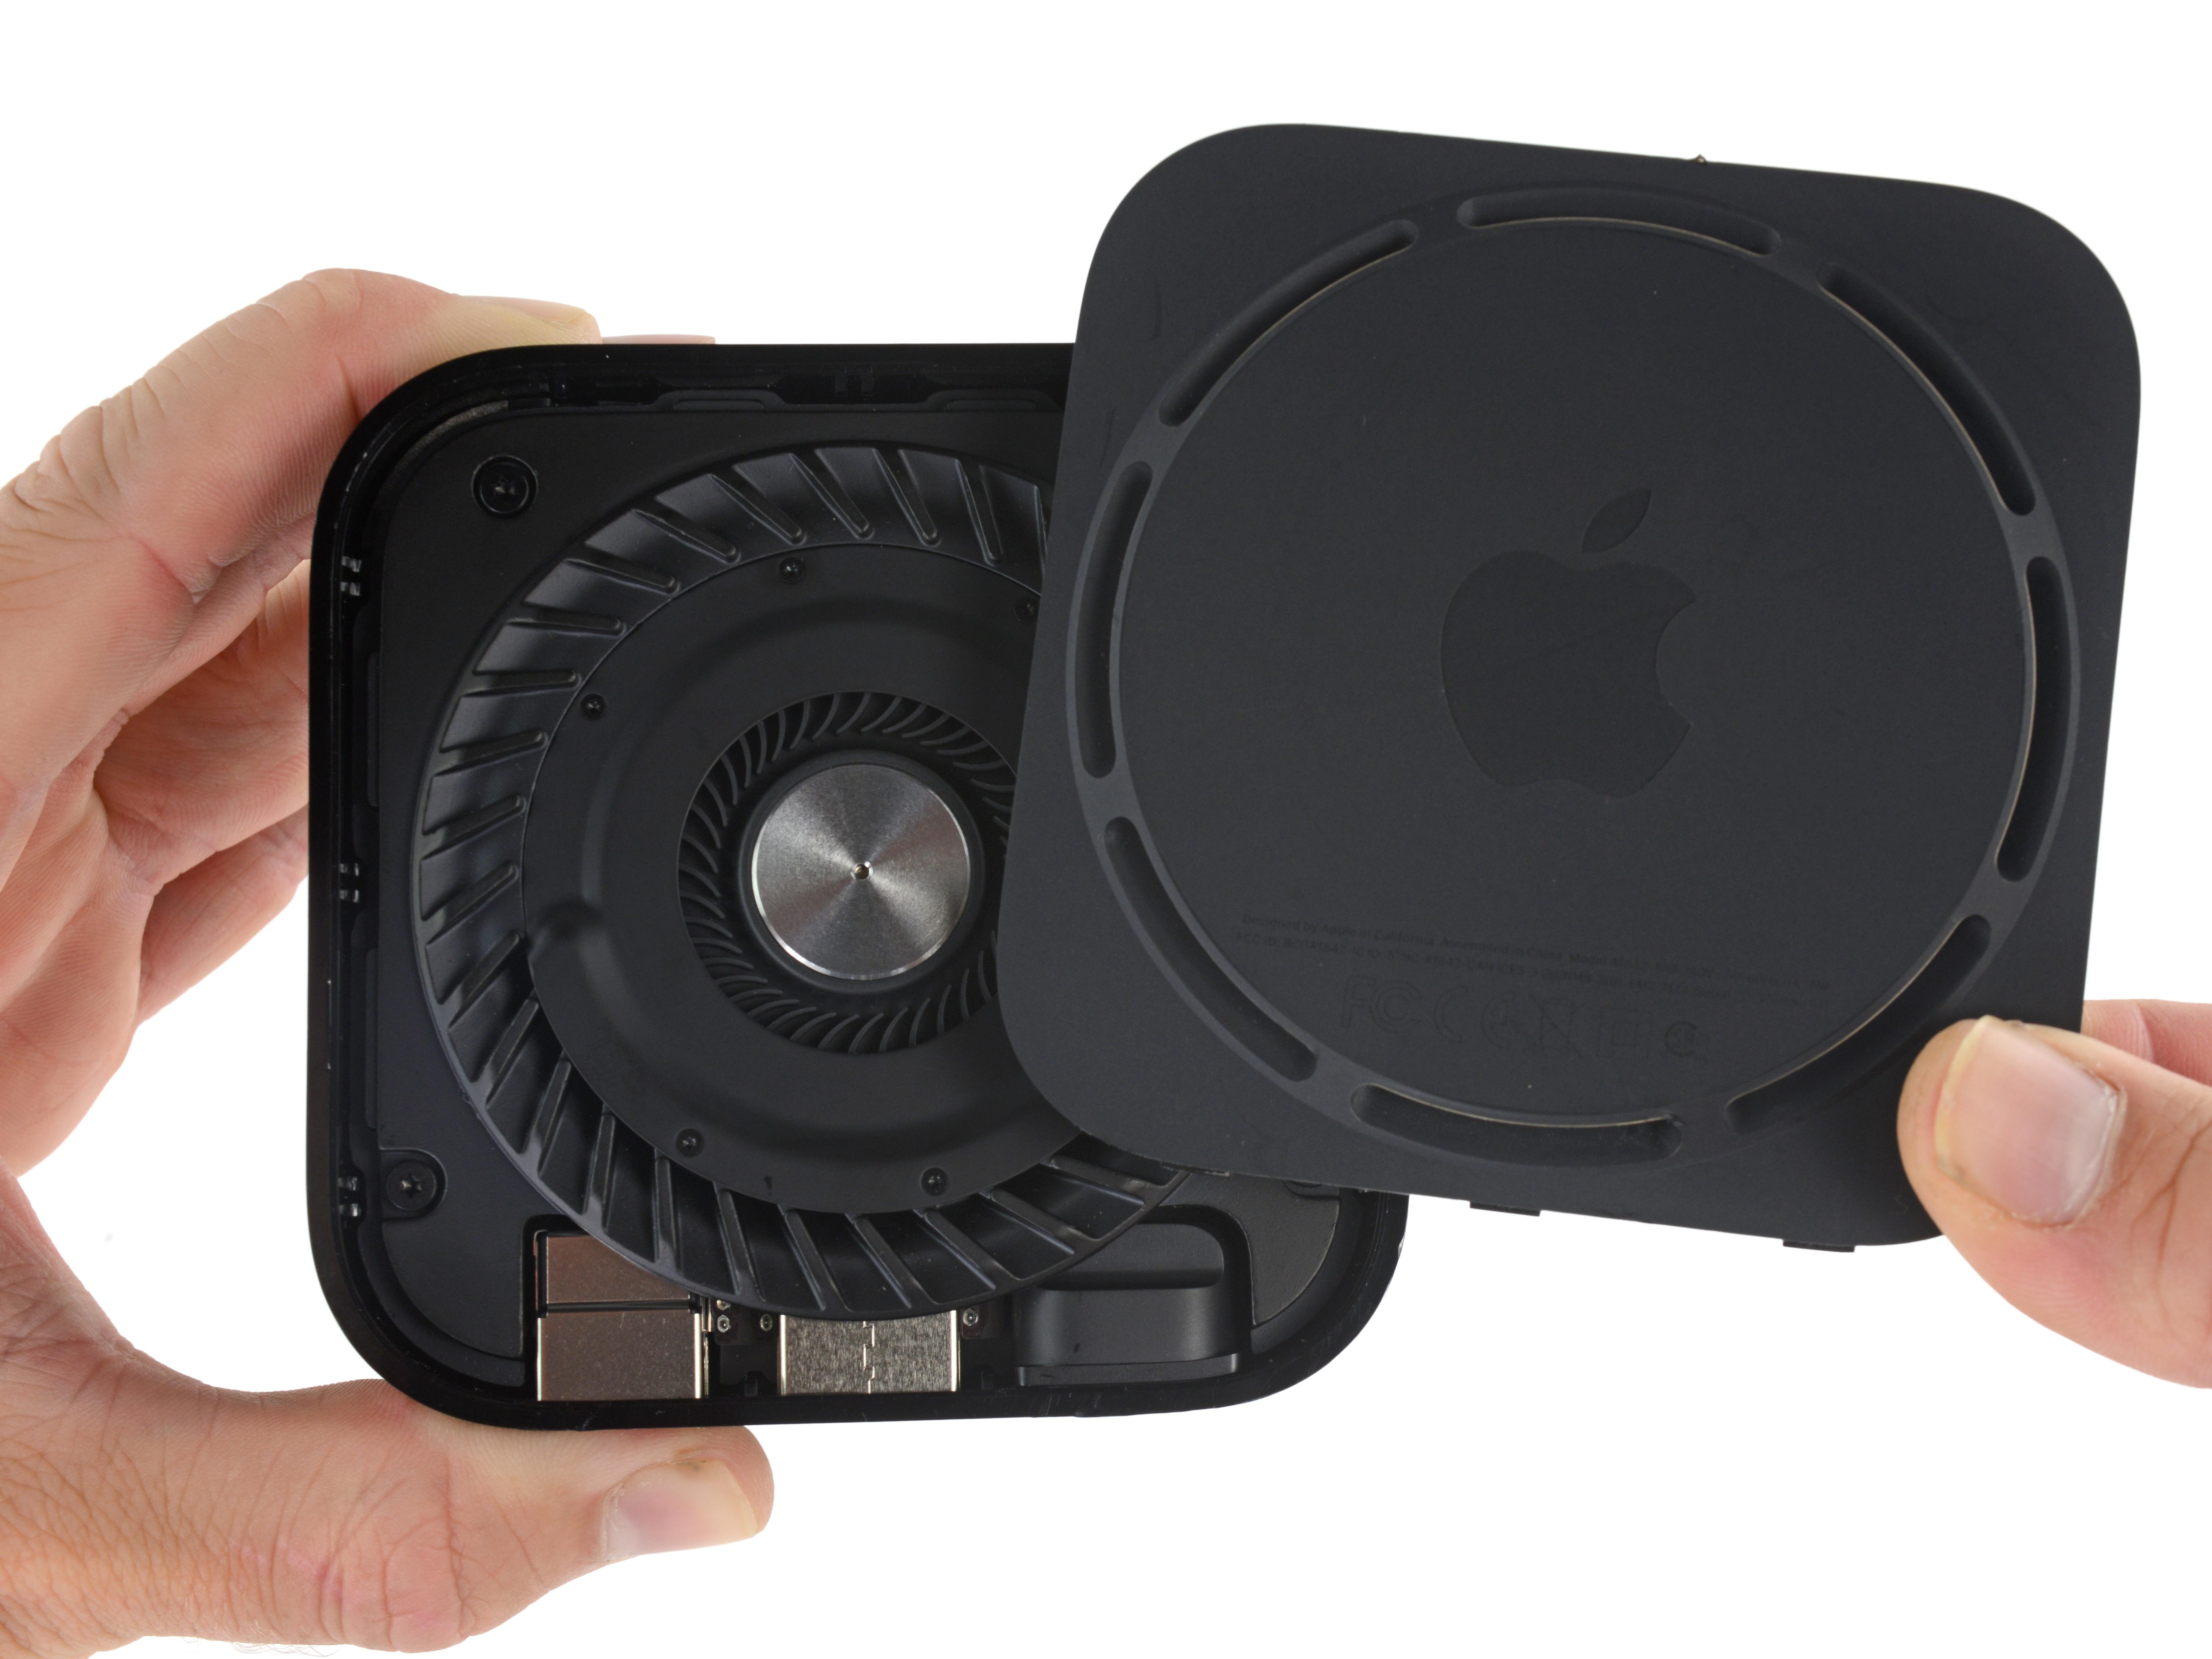 Apple TV 4K por dentro